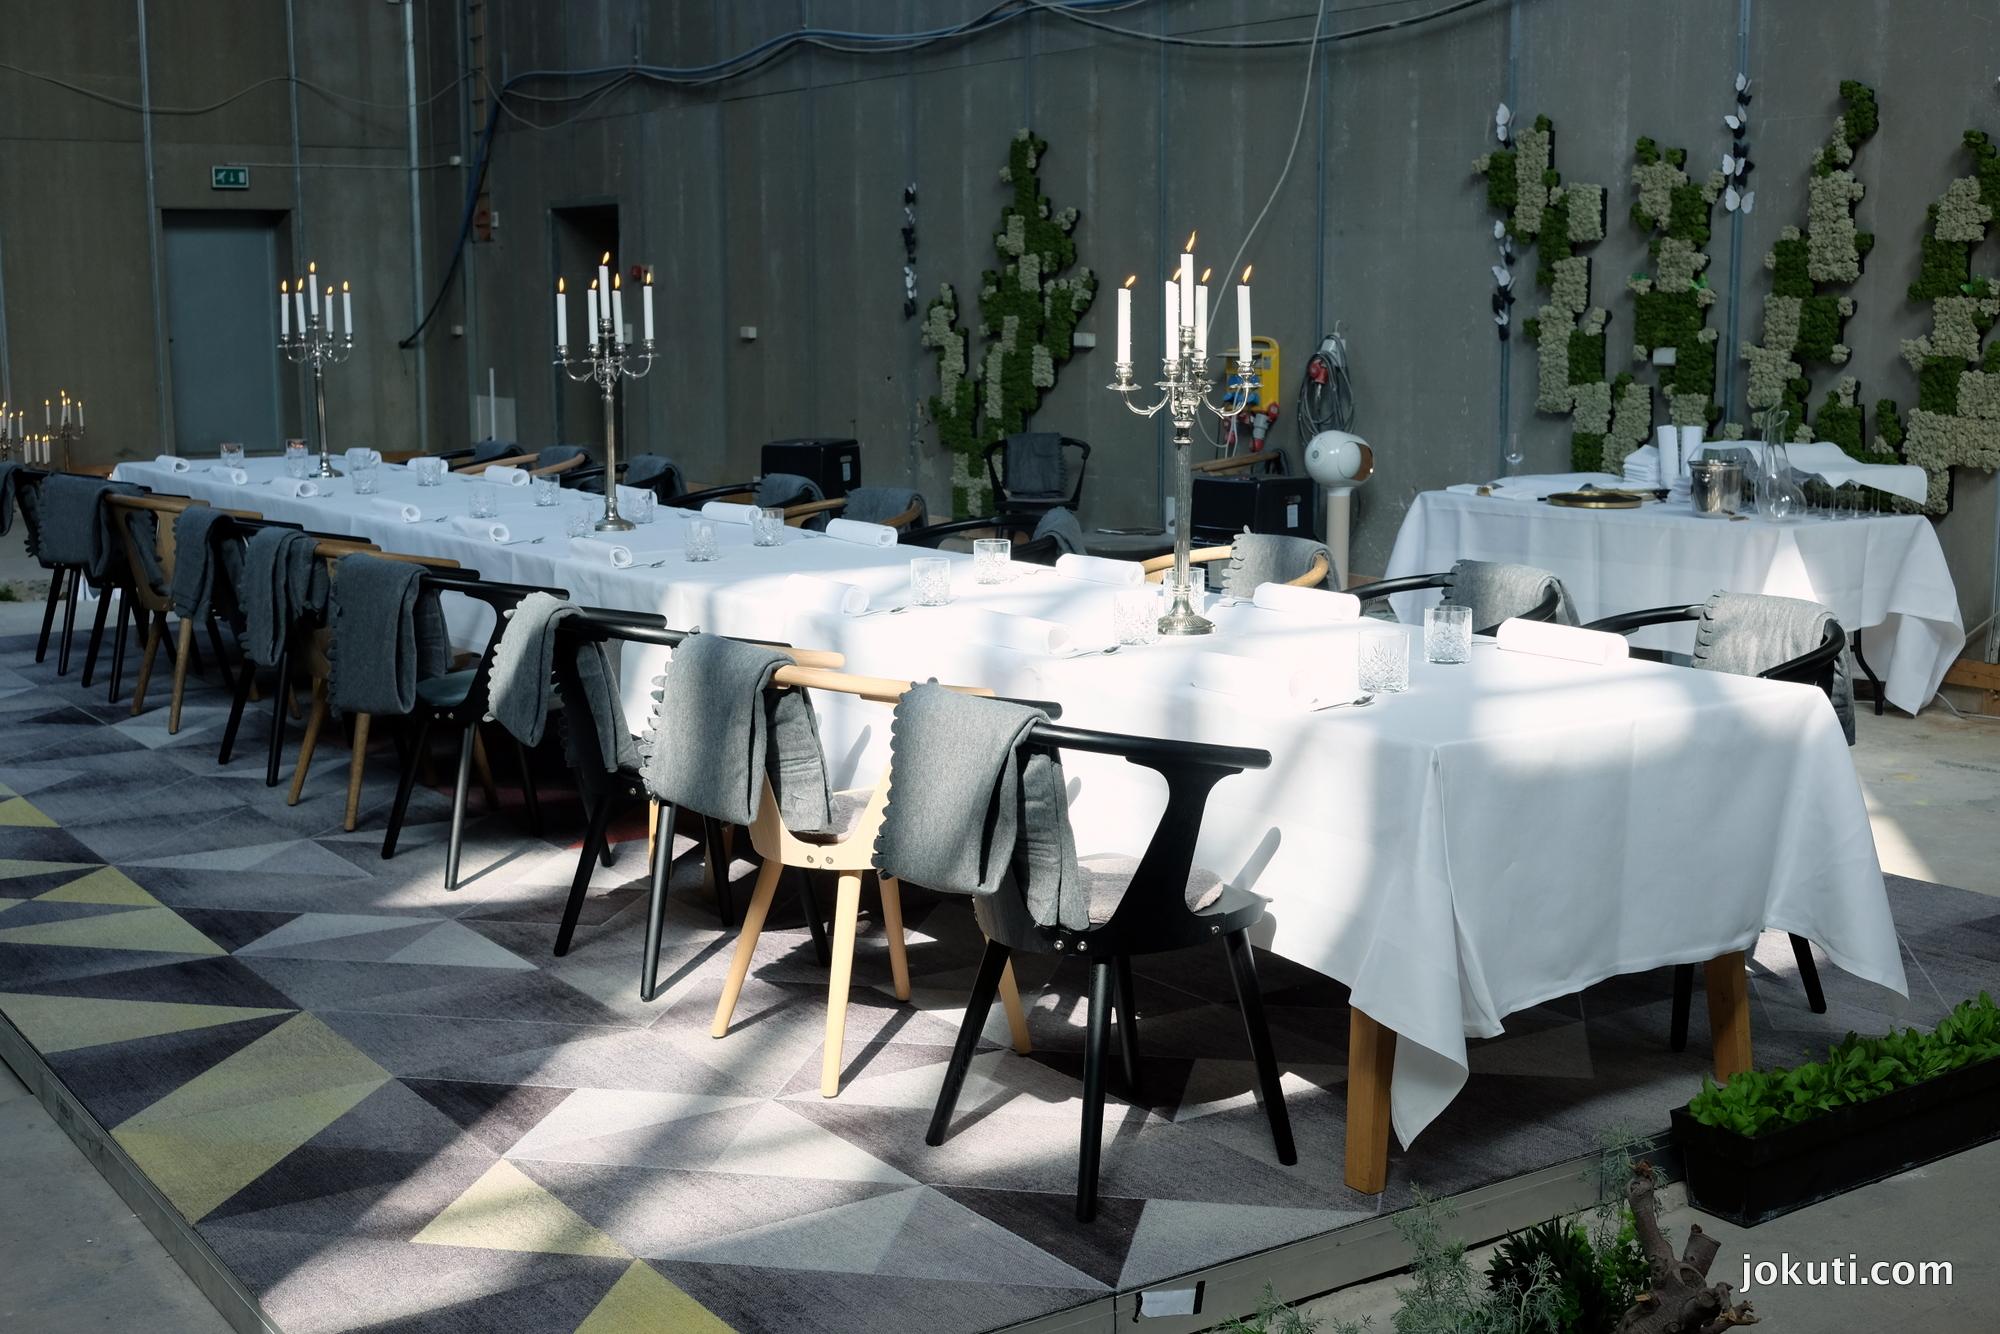 dscf5339_alchemist_popup_rasmus_munk_copenhagen_restaurant_vilagevo_jokuti.jpg